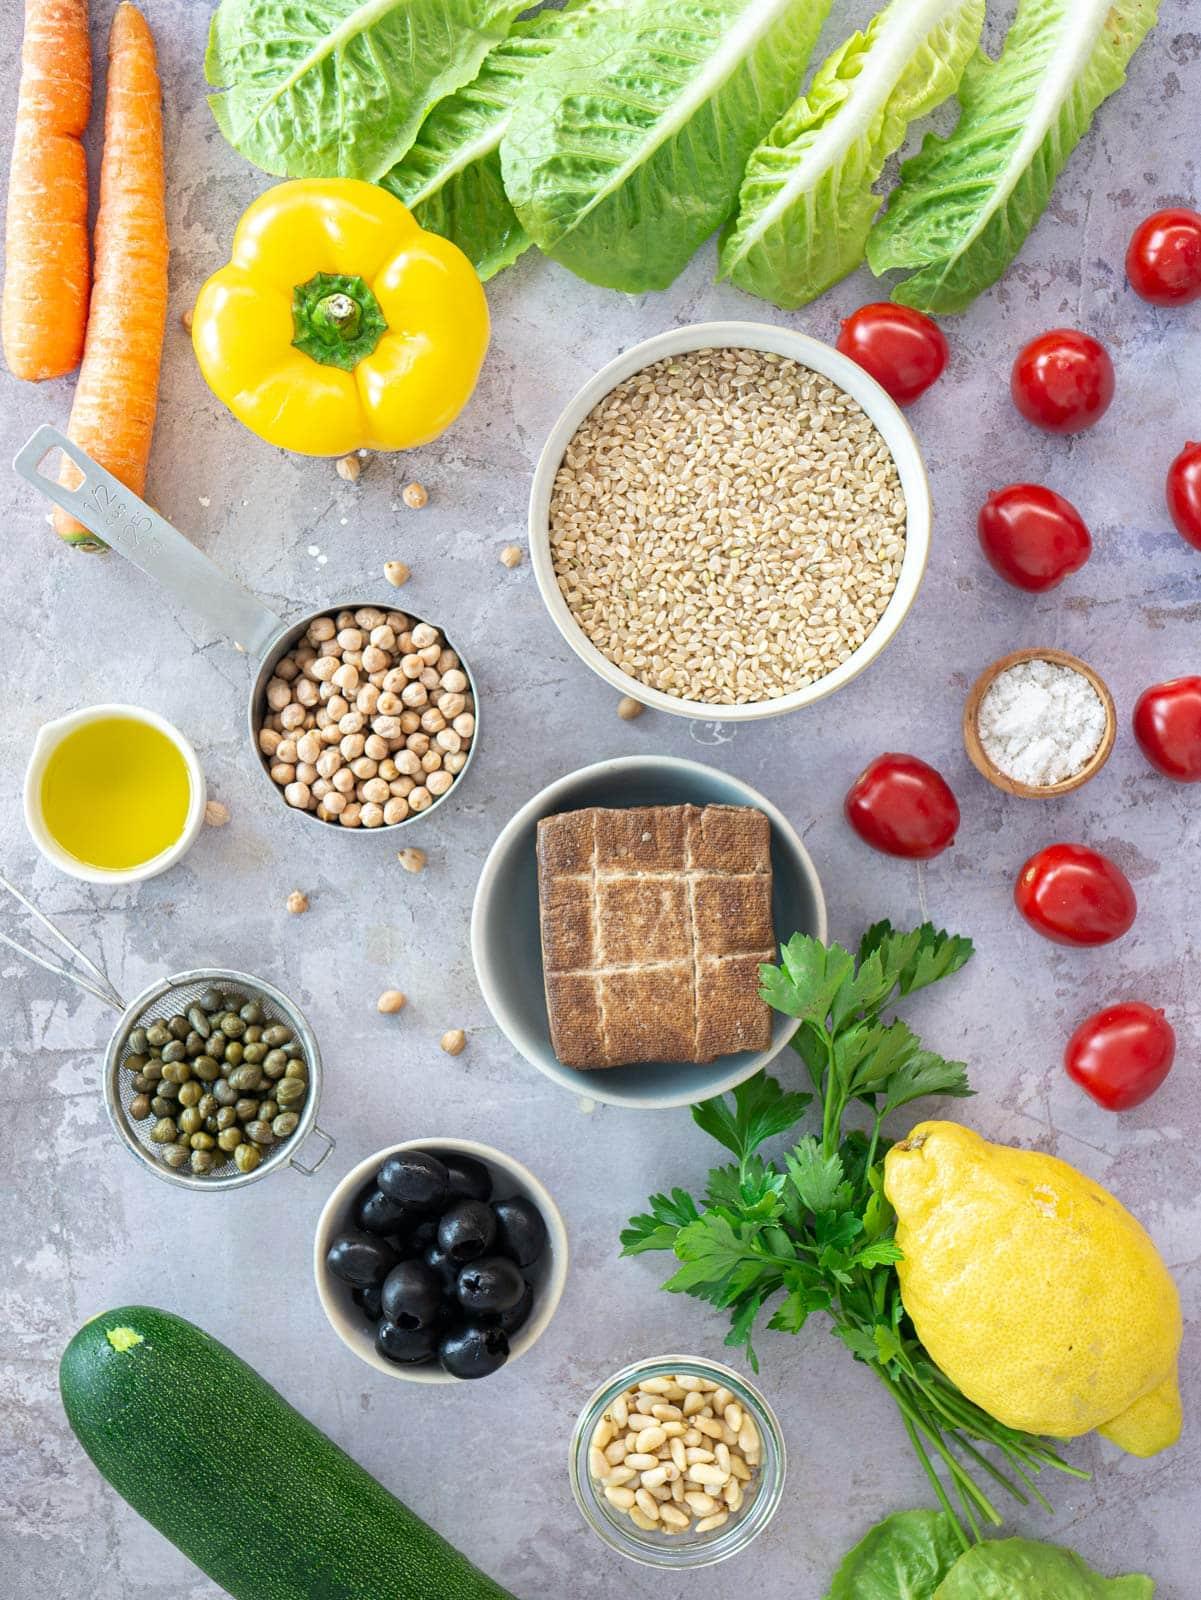 Ingredienti per l'insalata di riso vegana all'italiana